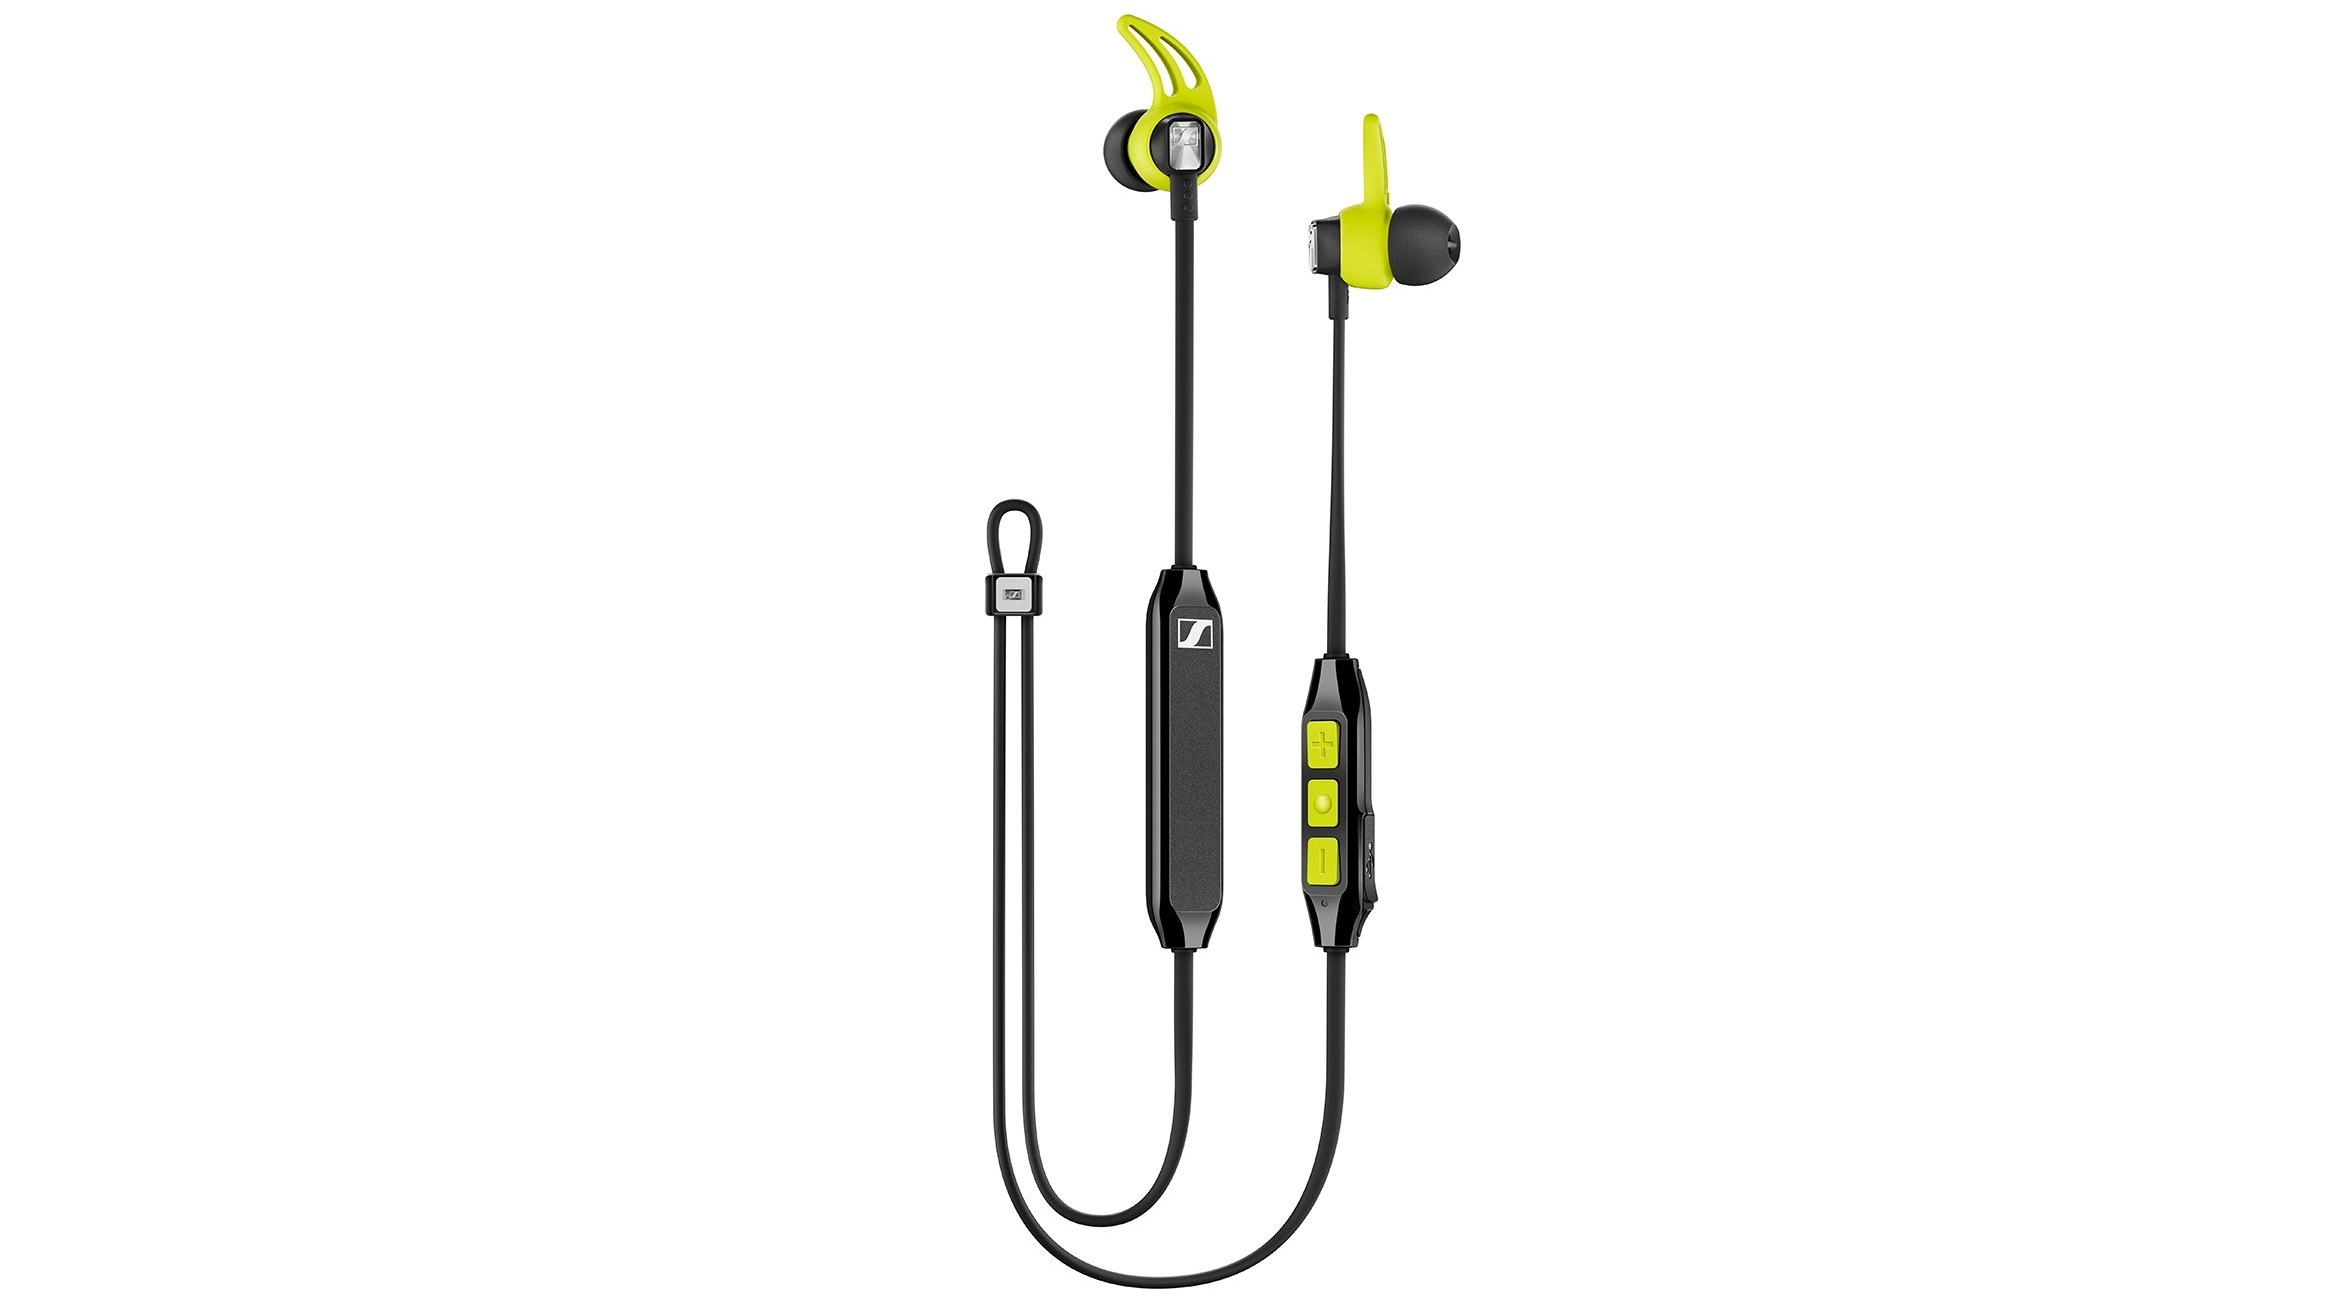 c5c4b056669 Cheap Sennheiser CX SPORT Bluetooth Wireless In-Ear Headphones | Harvey  Norman AU